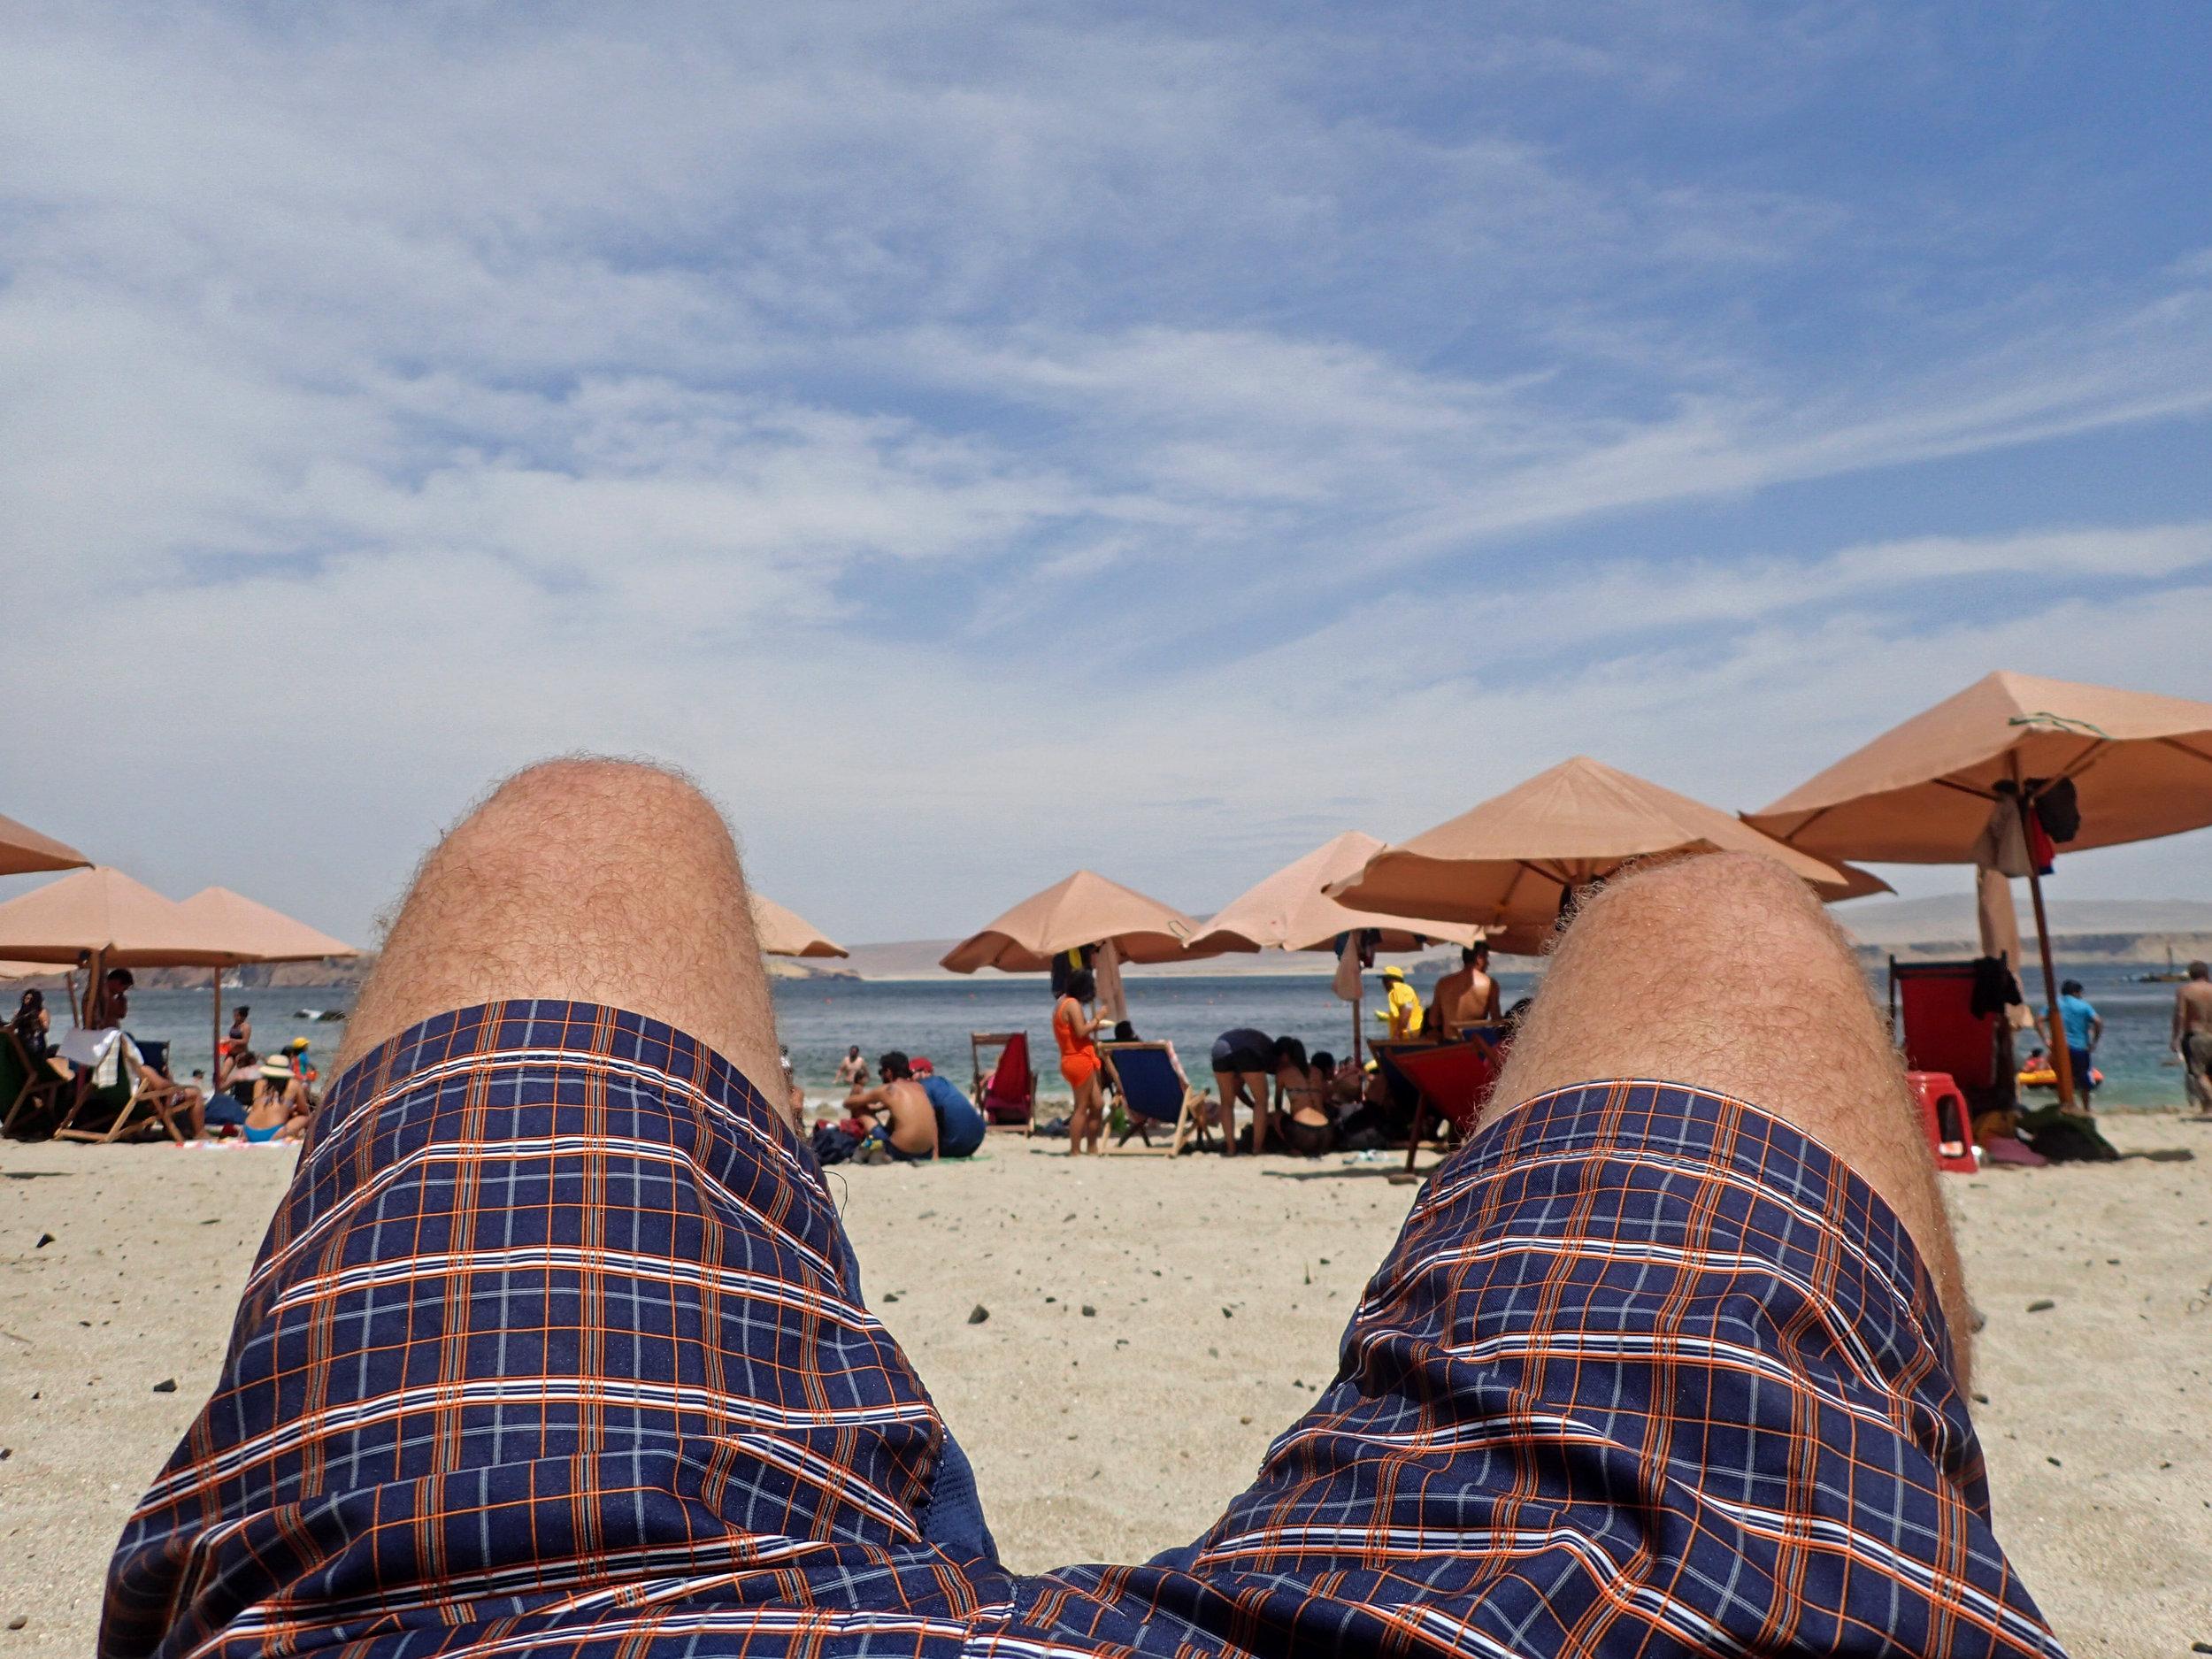 chubby legs.jpg